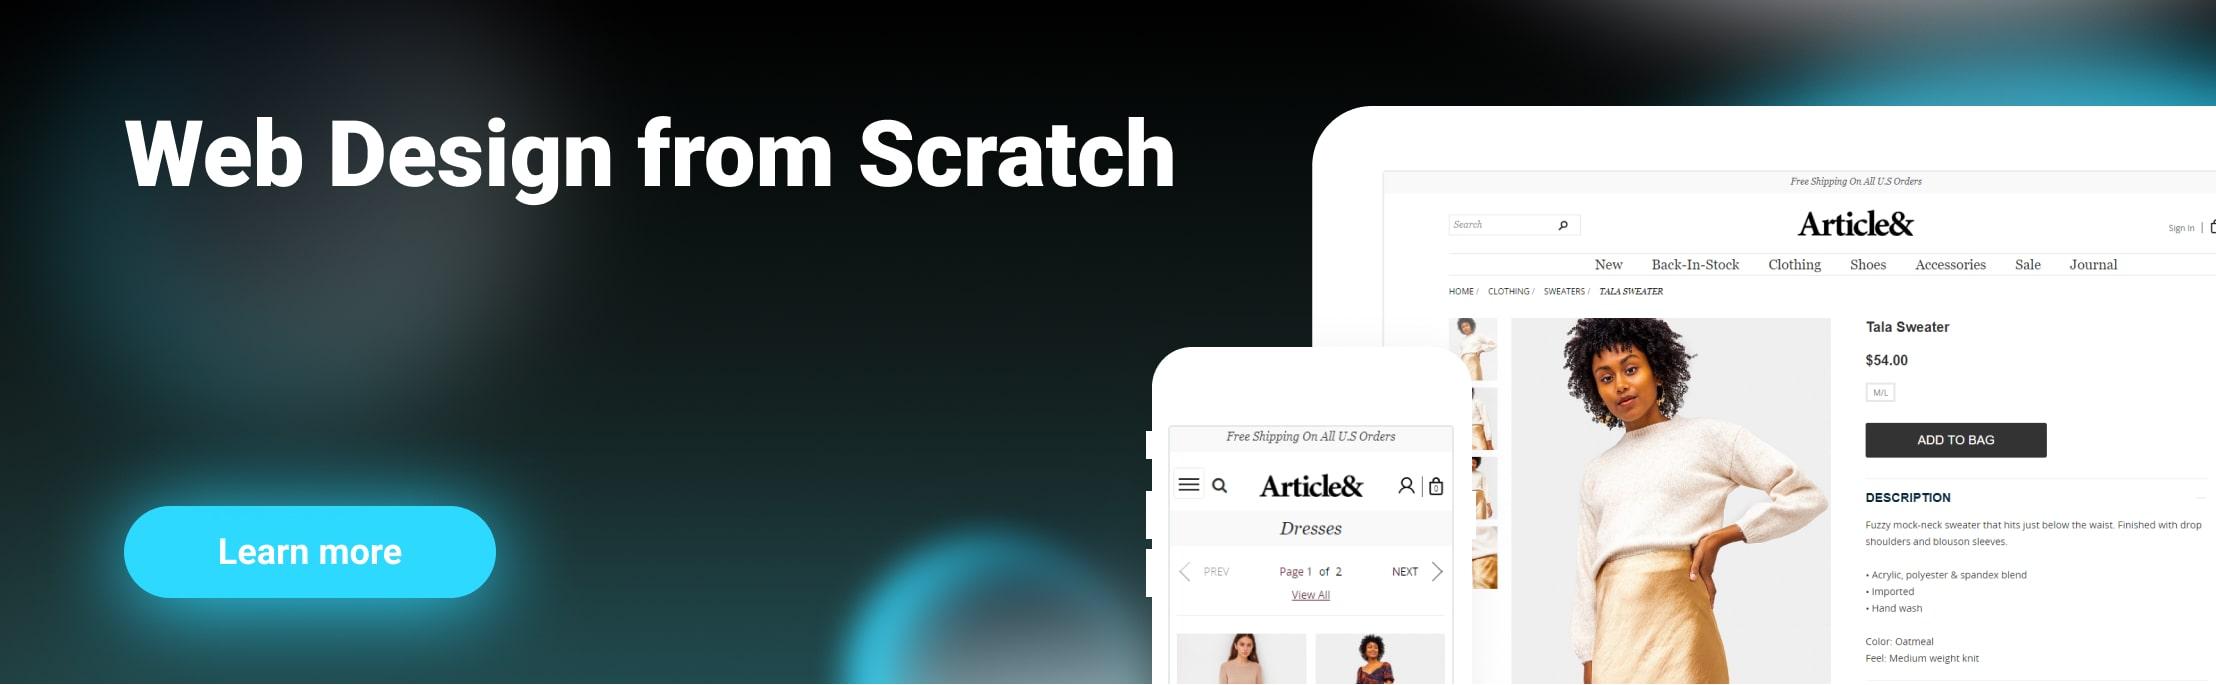 Web Design from Scratch